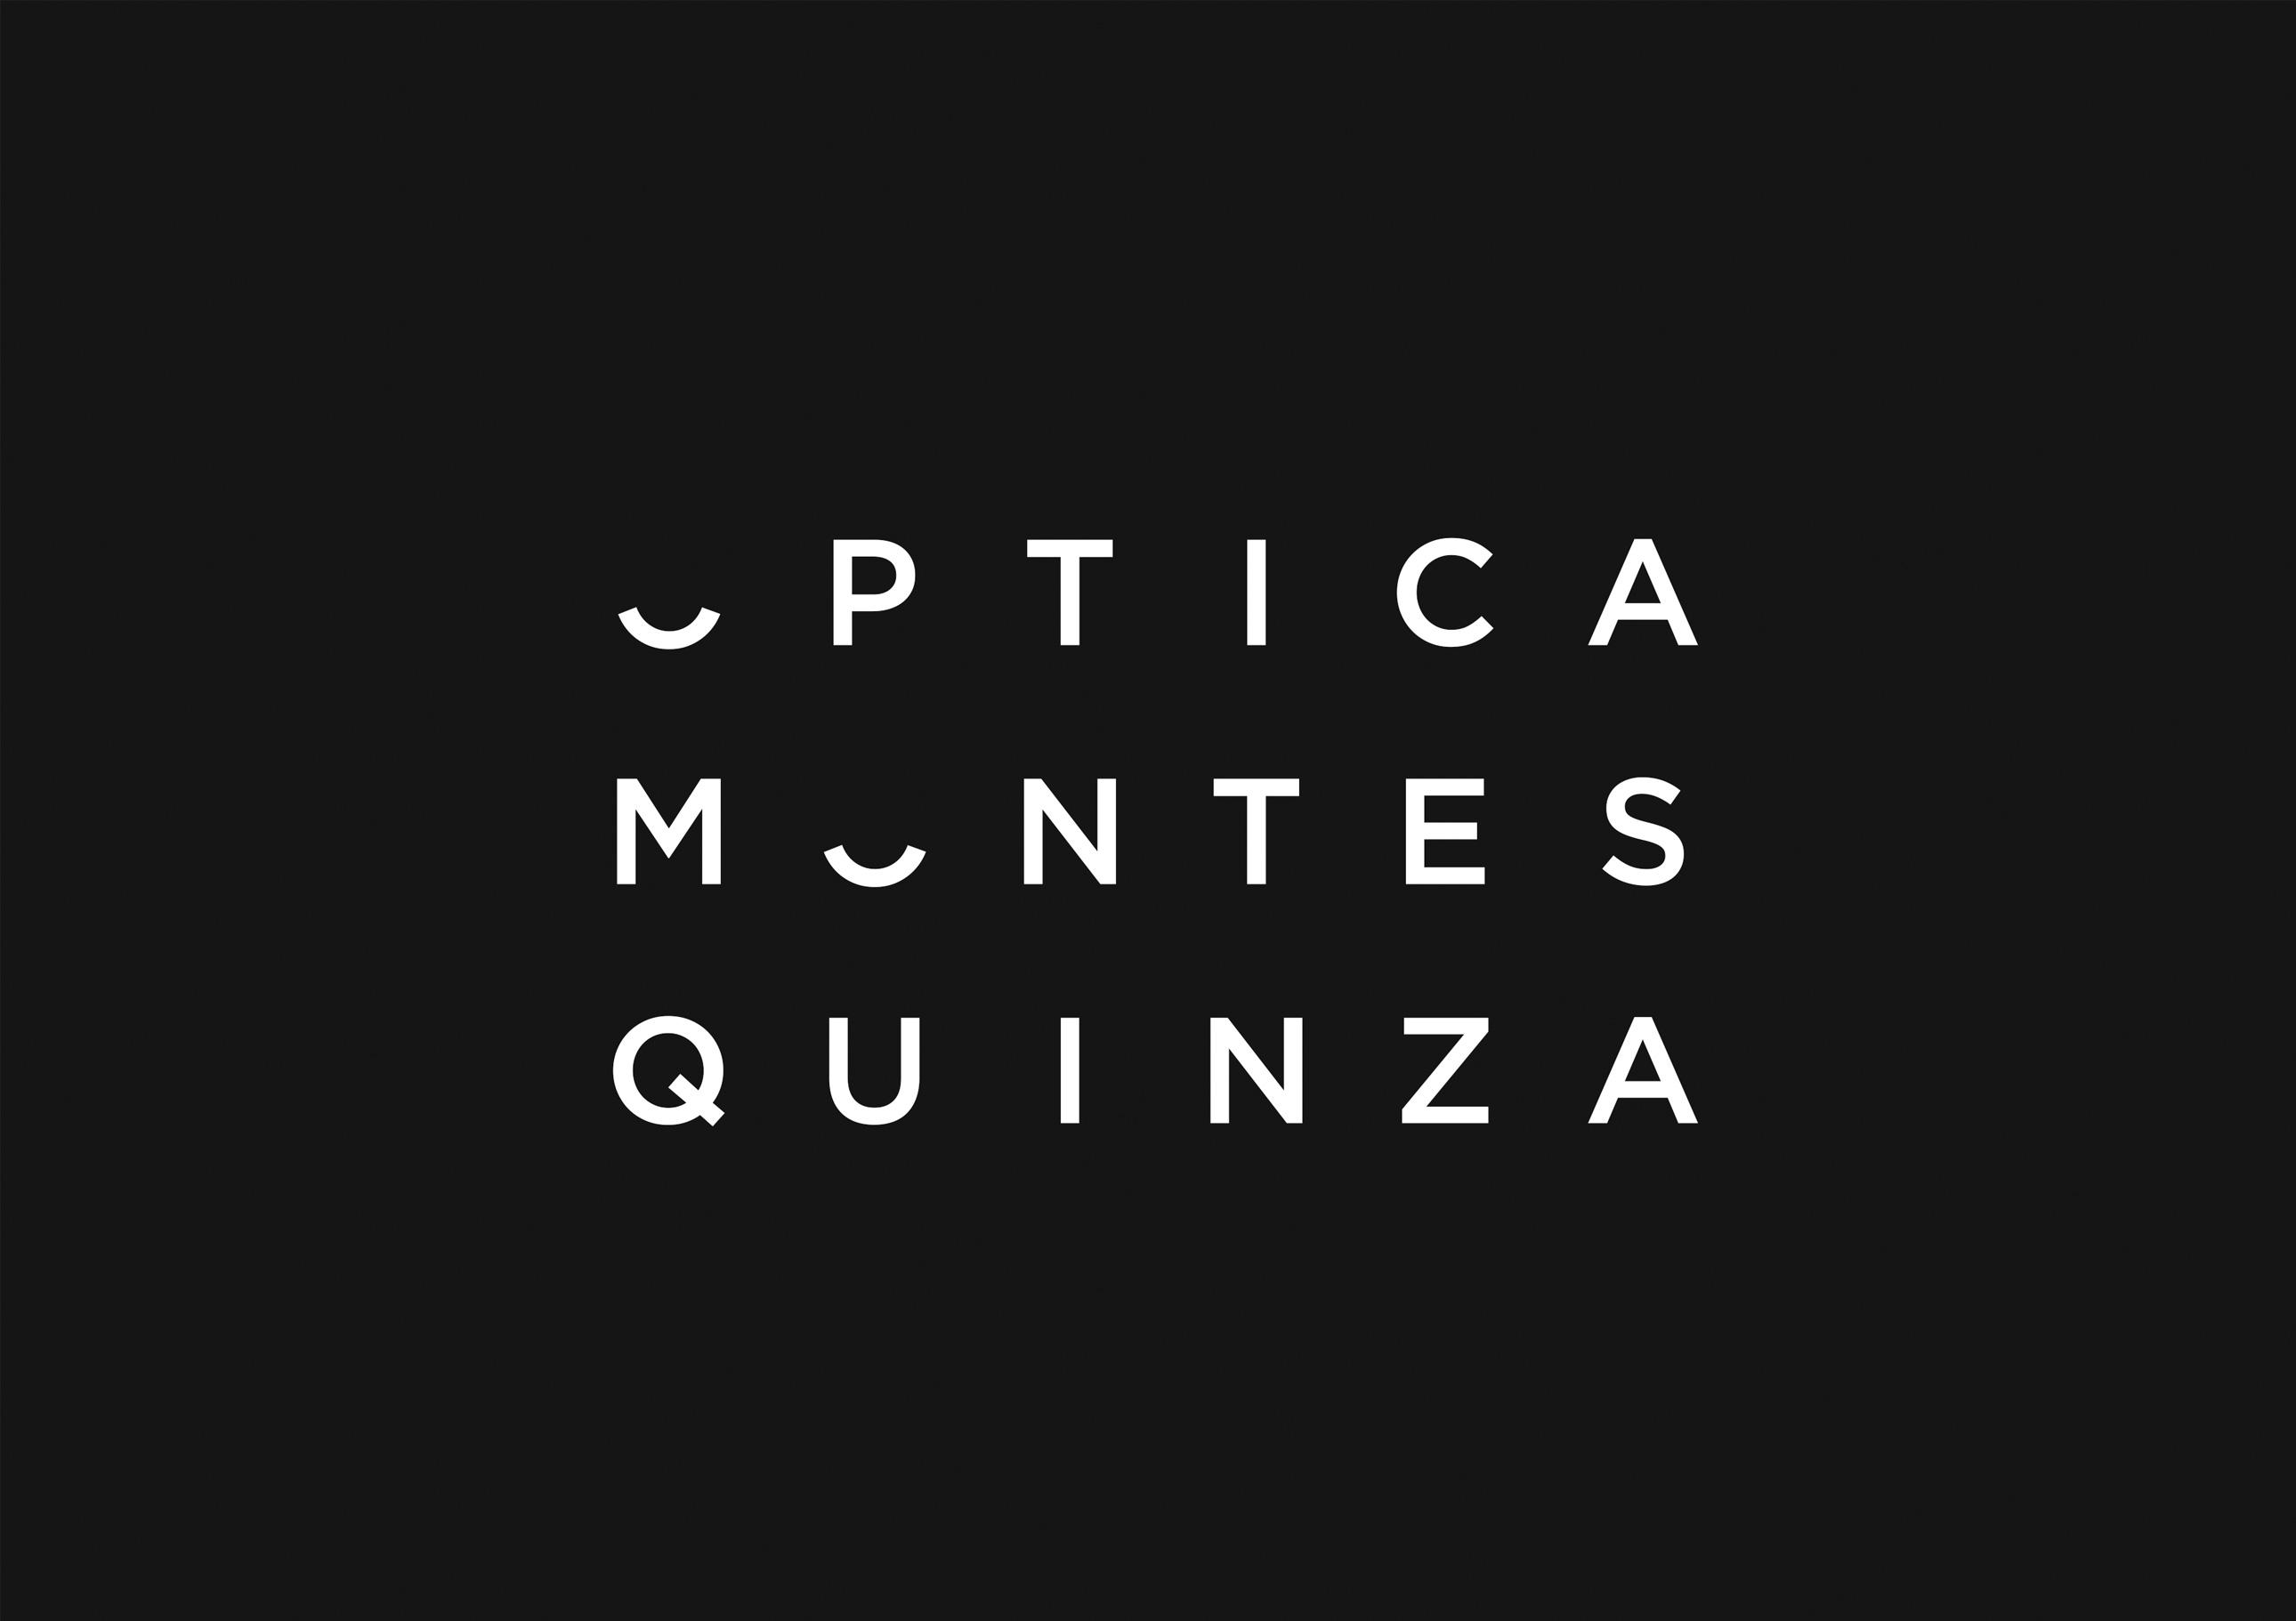 Imagen dos Montesquinza